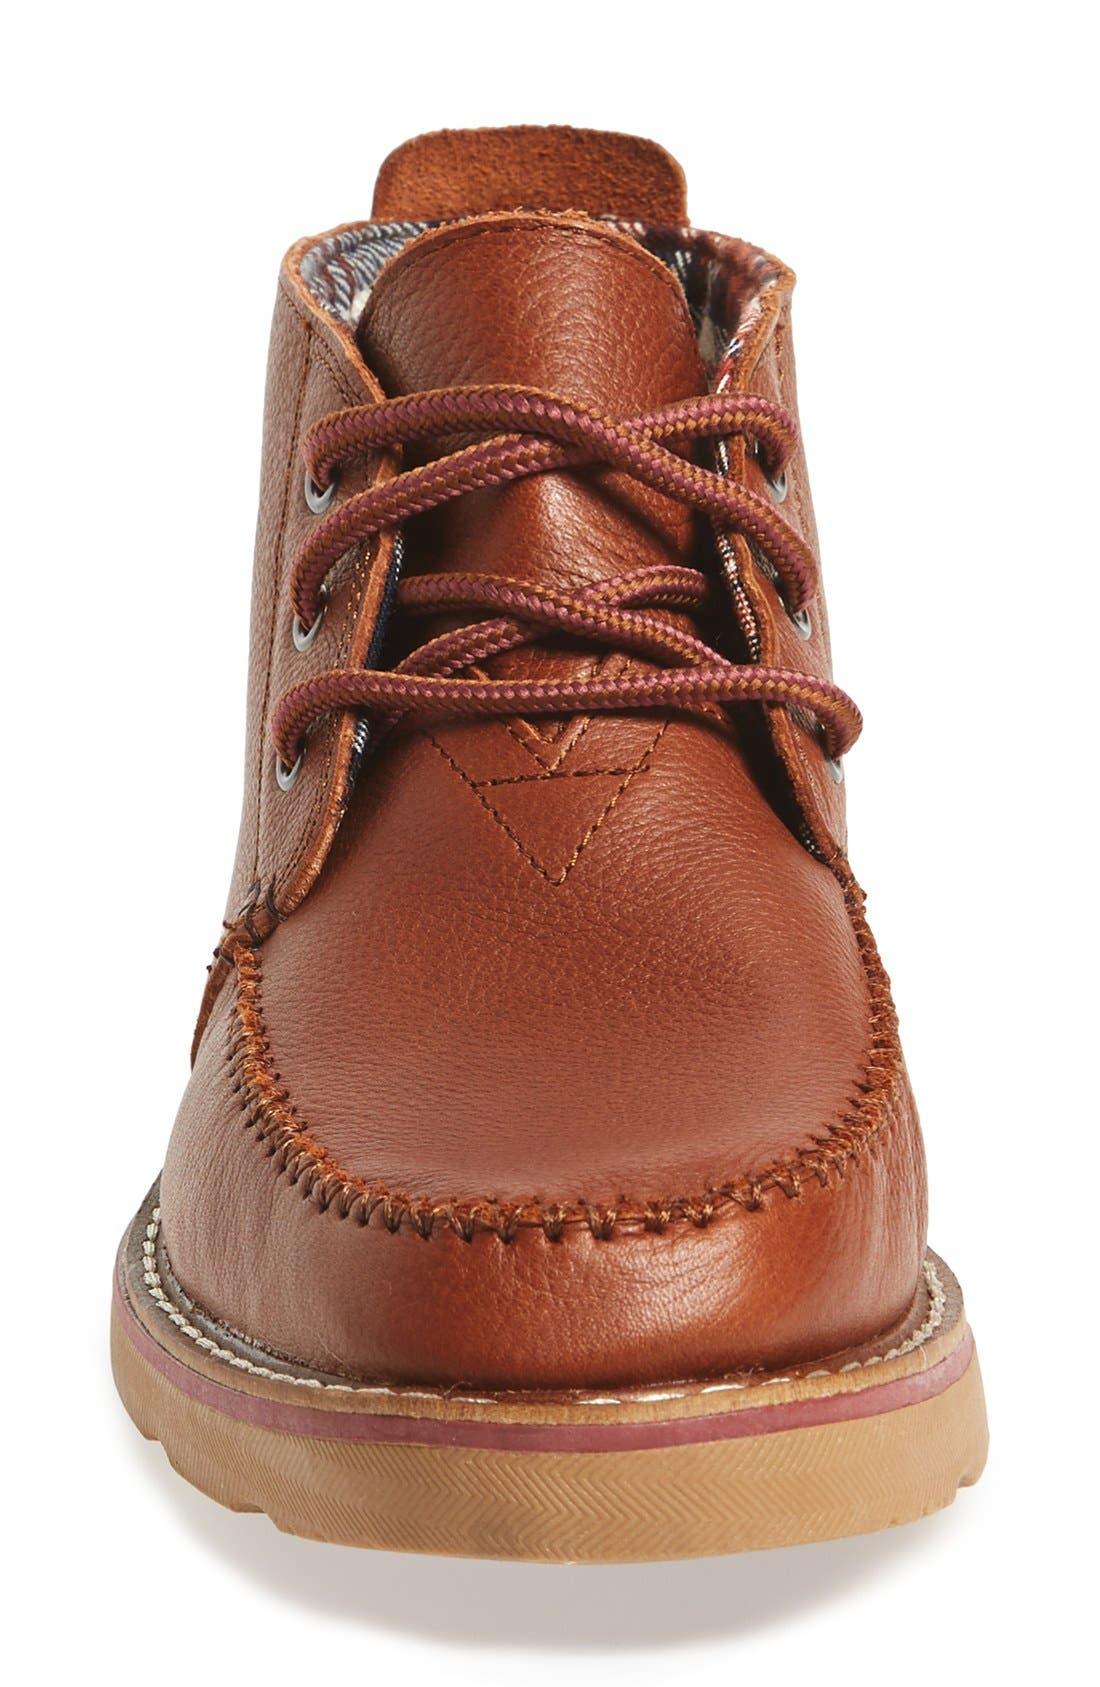 Waterproof Chukka Boot,                             Alternate thumbnail 13, color,